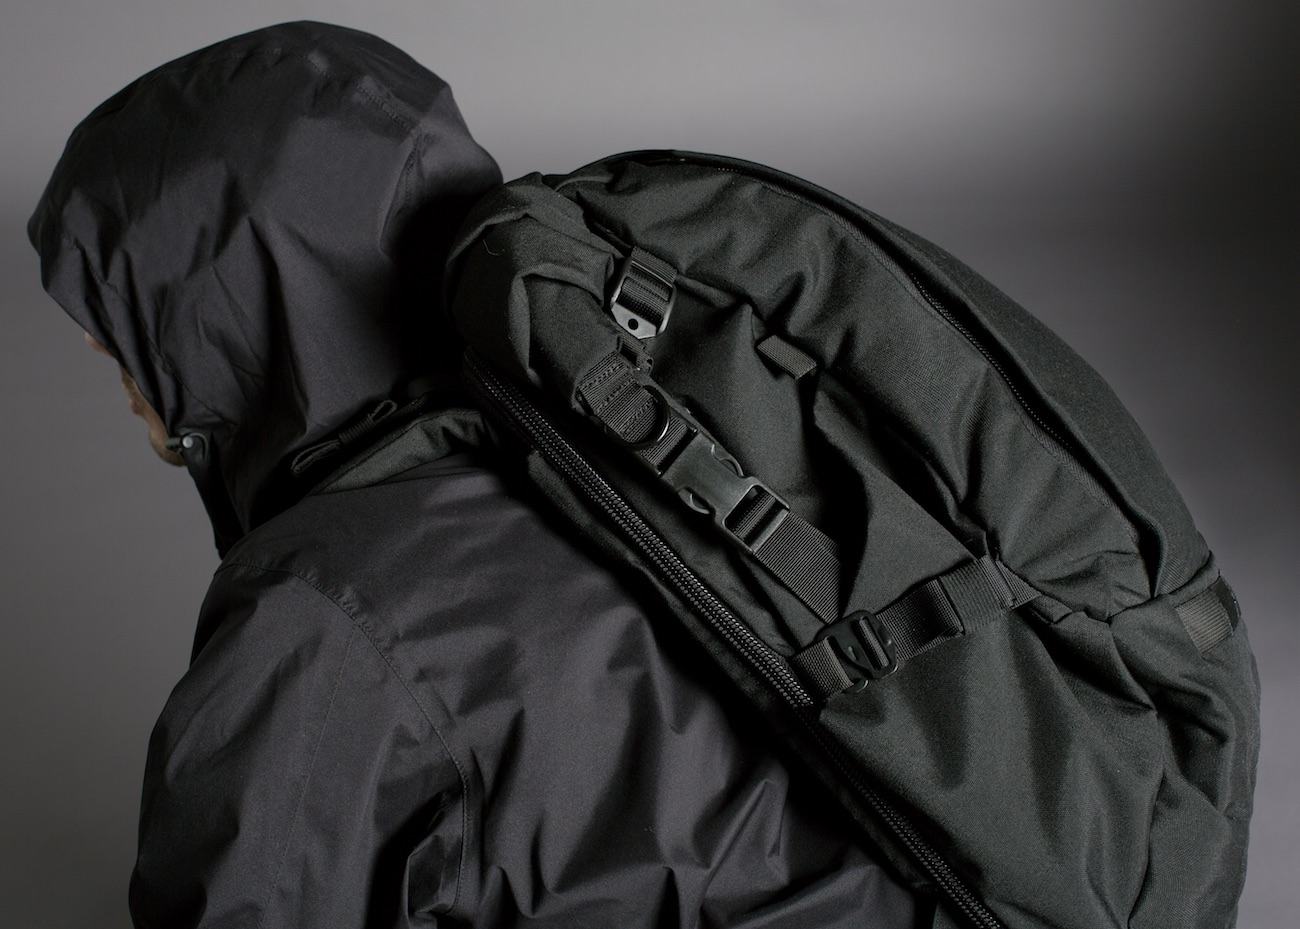 Attitude Supply ATD1 Adaptive Backpack